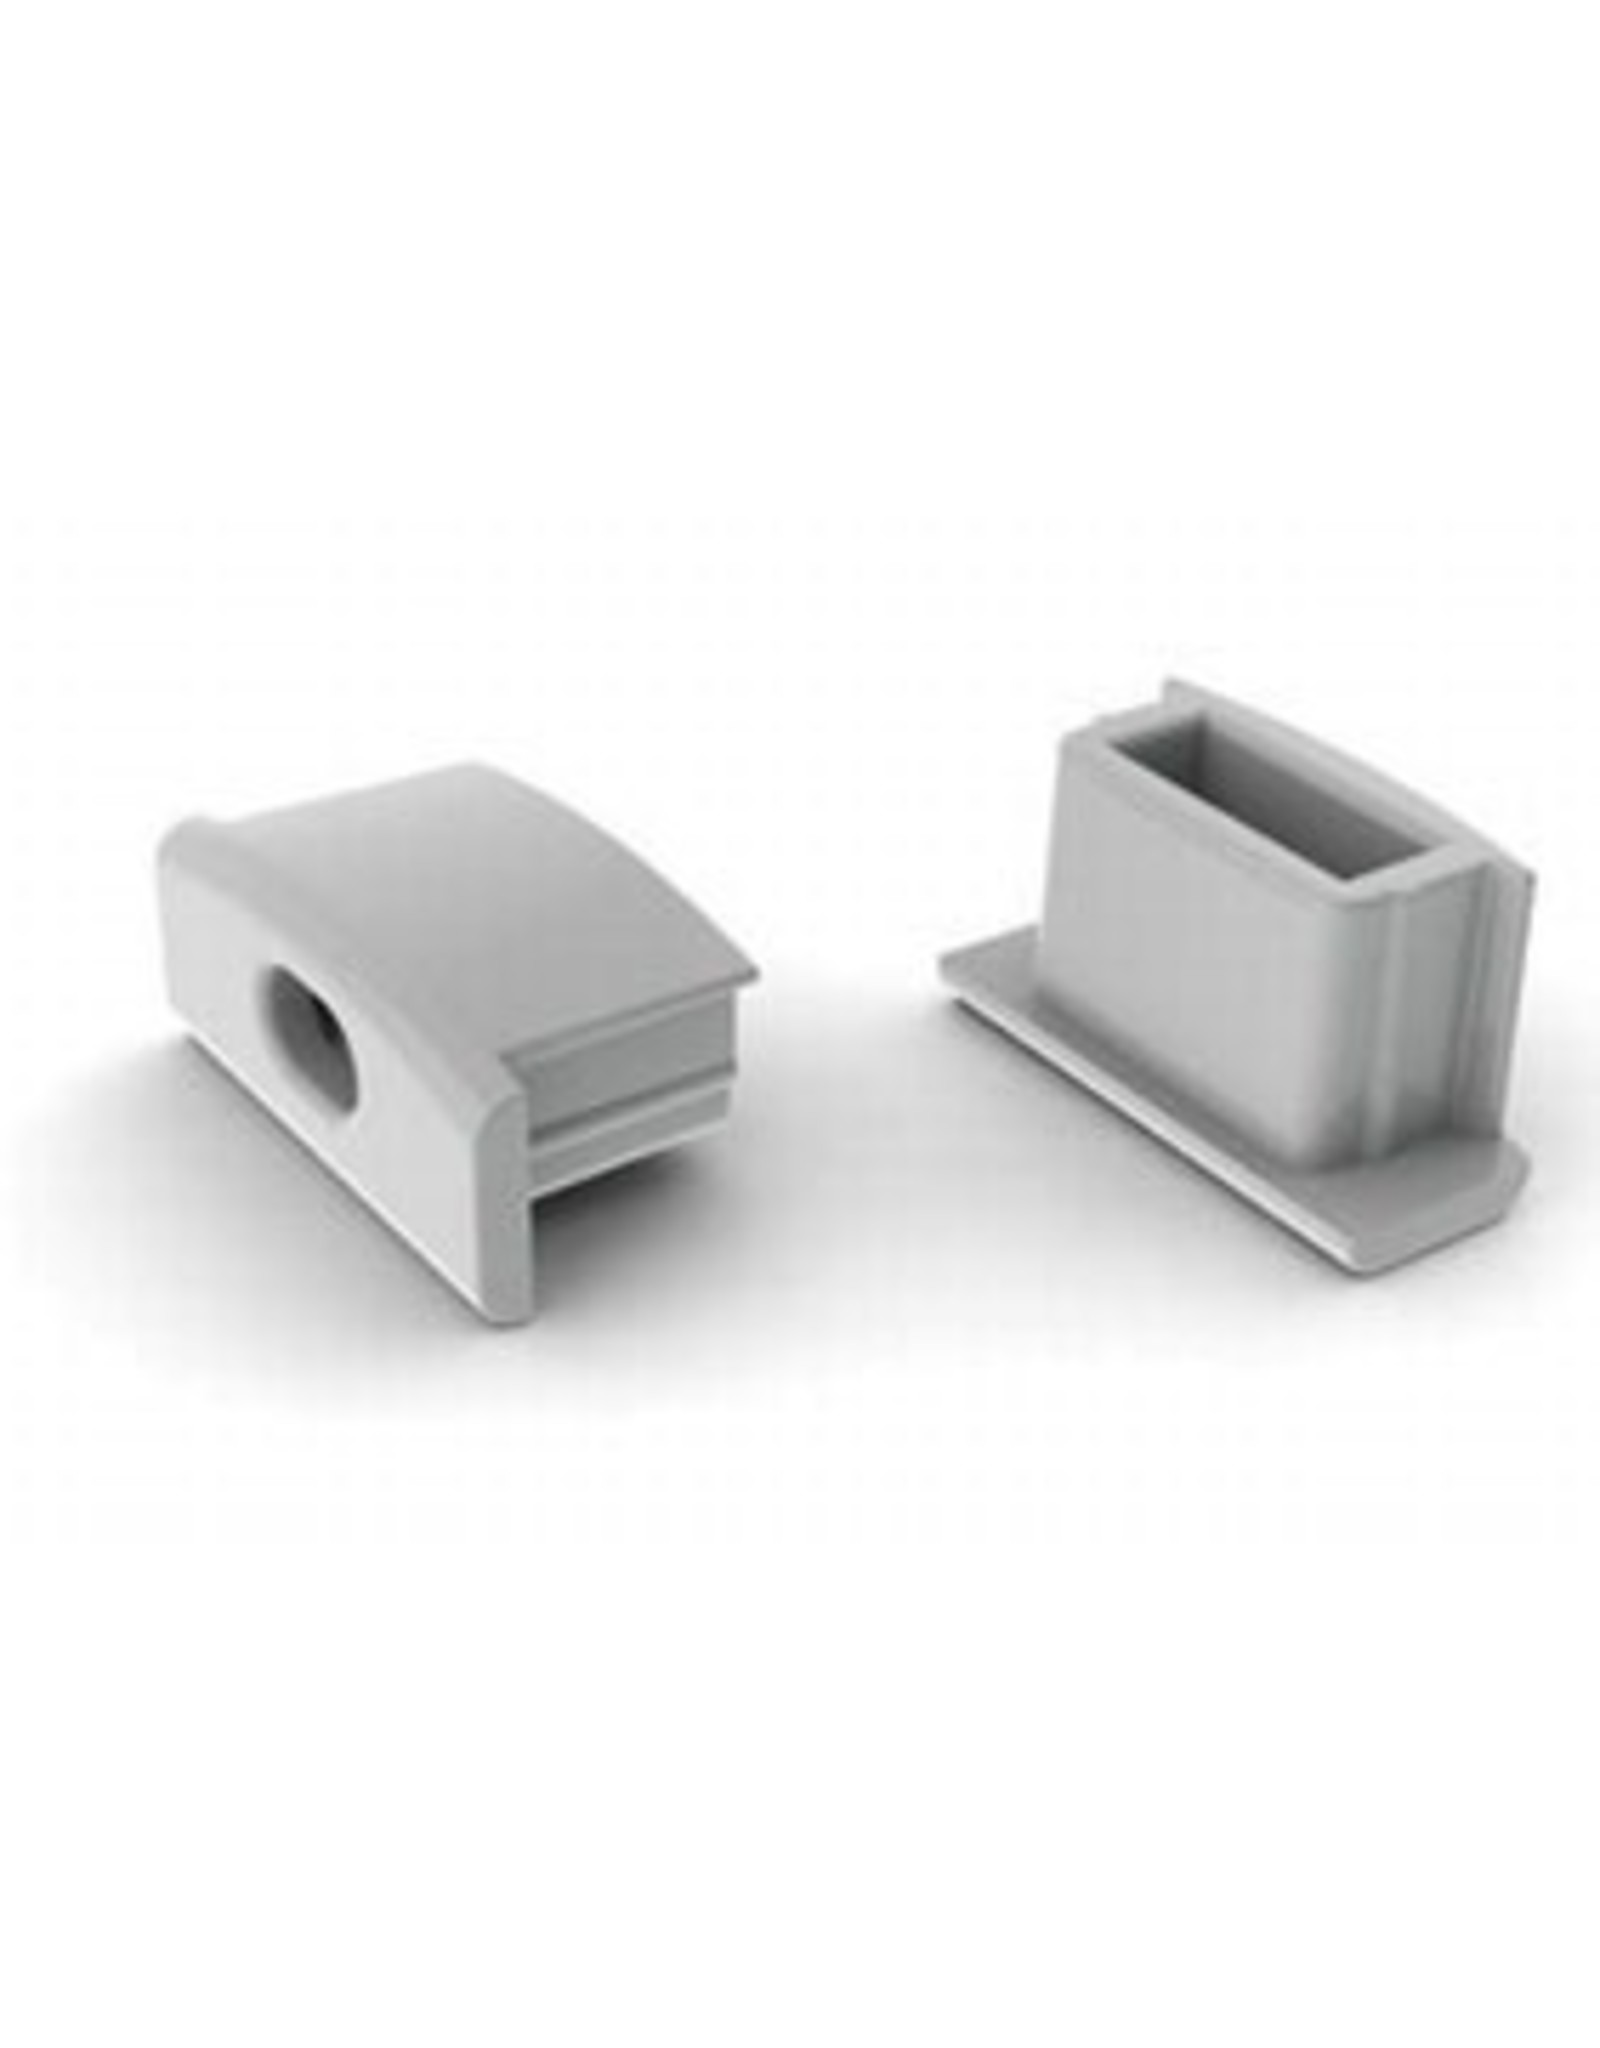 Lights Alu-profile Endcap U - 6mm - per piece